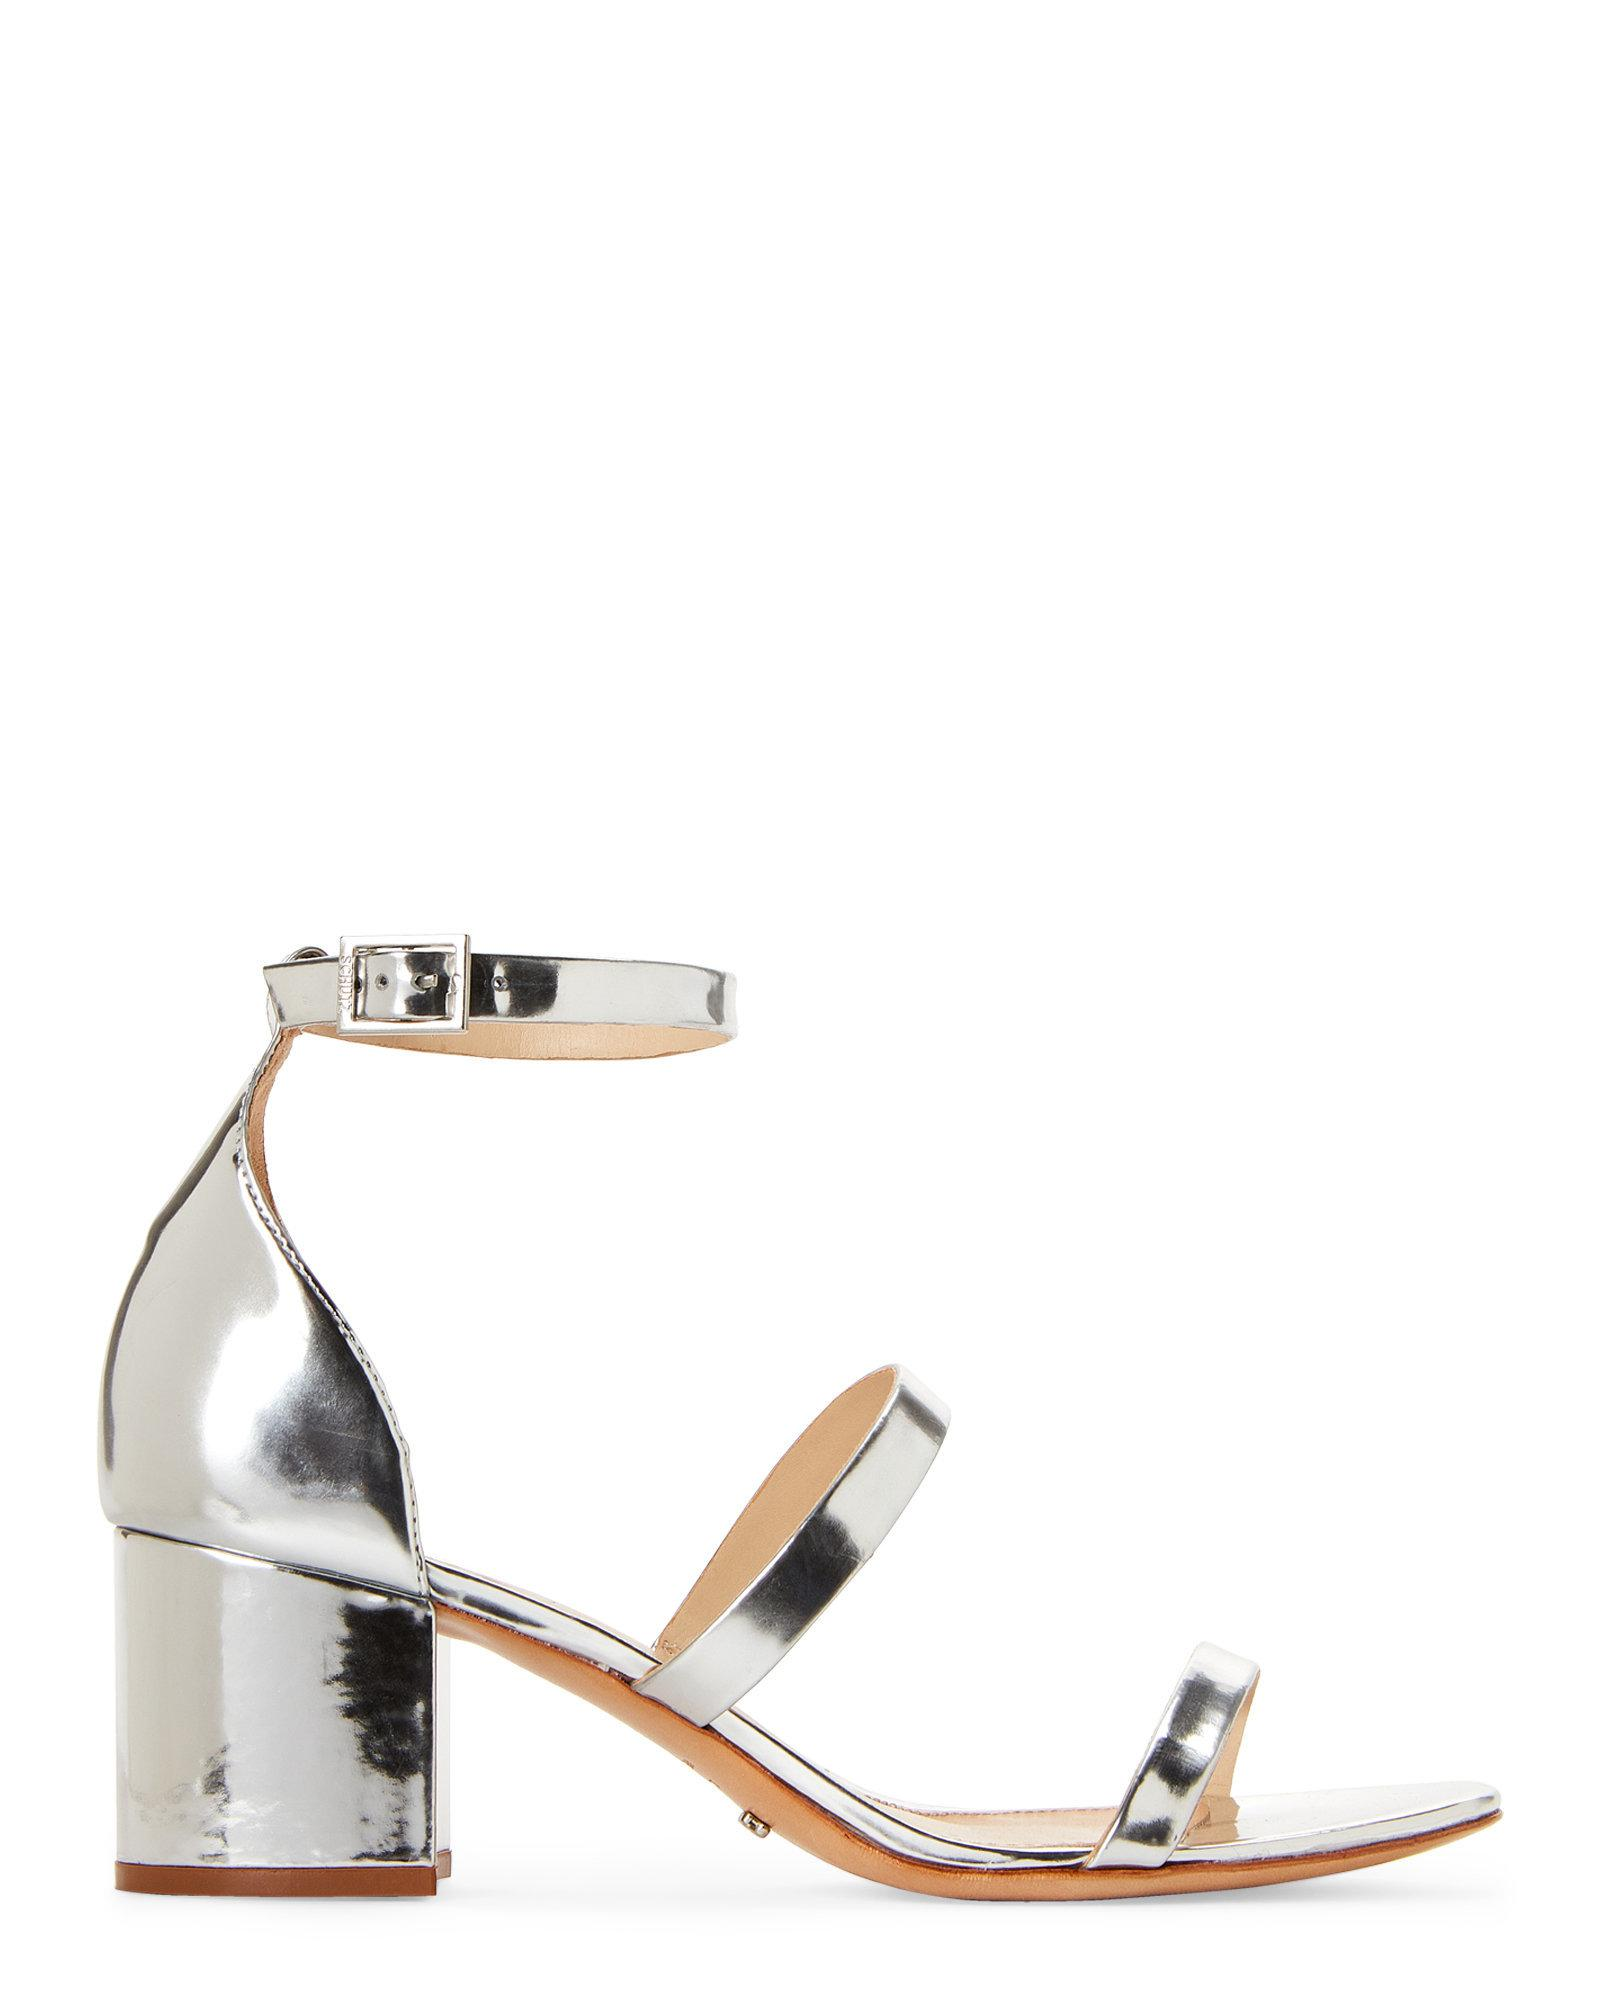 afad7b7db0d Lyst - Schutz Silver Ruby Strappy Block Heel Sandals in Metallic